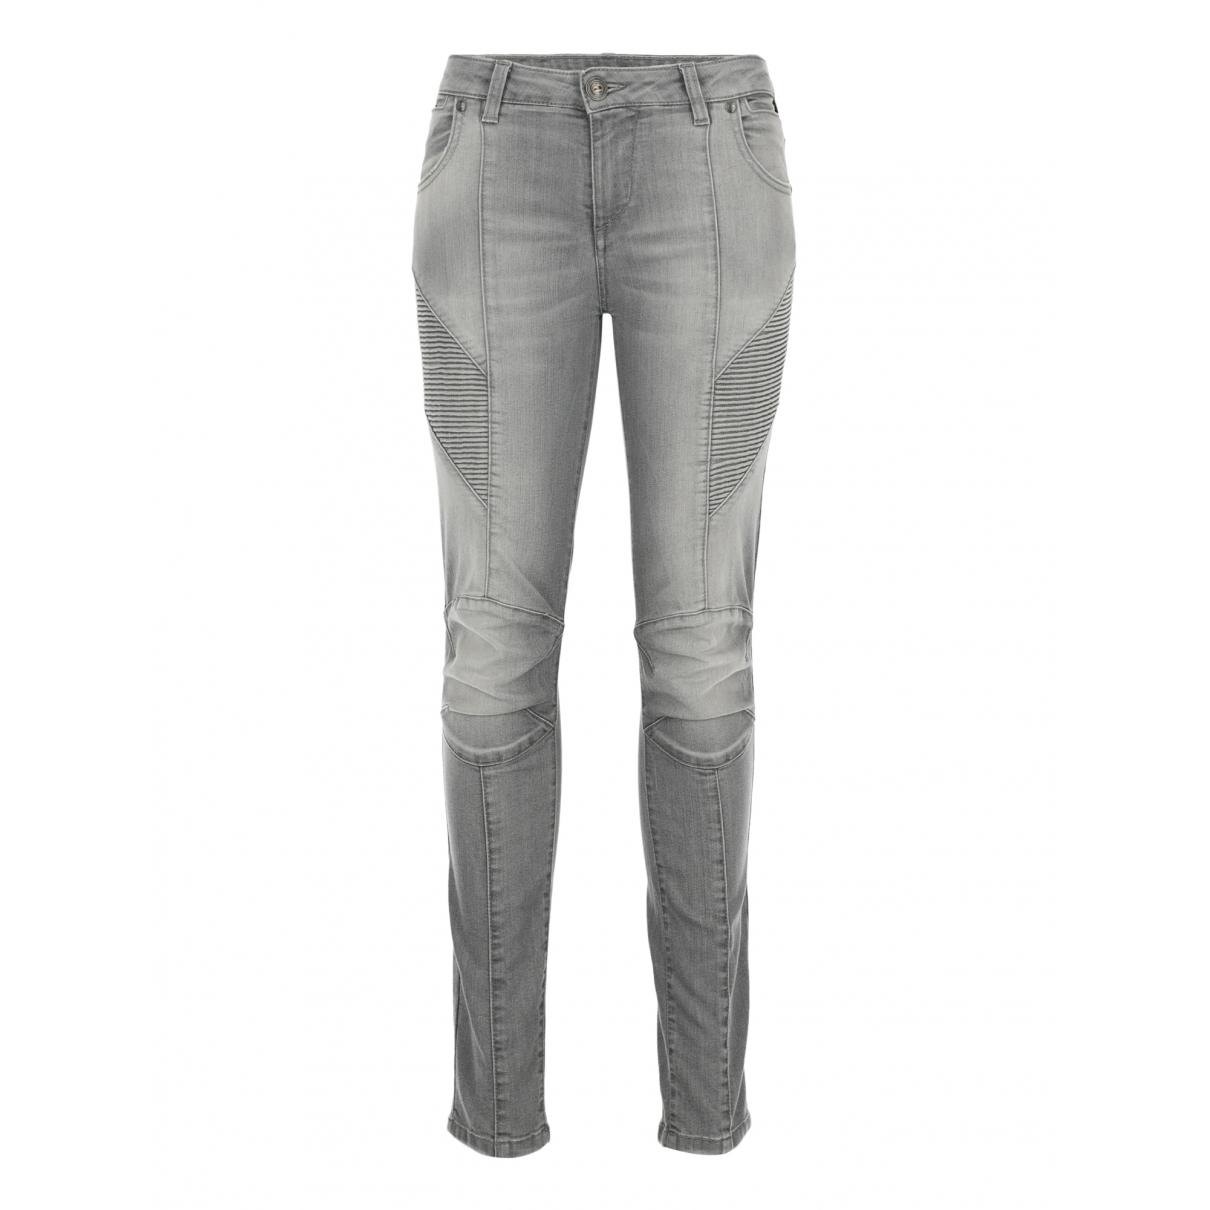 Balmain \N Grey Cotton Jeans for Women 26 US